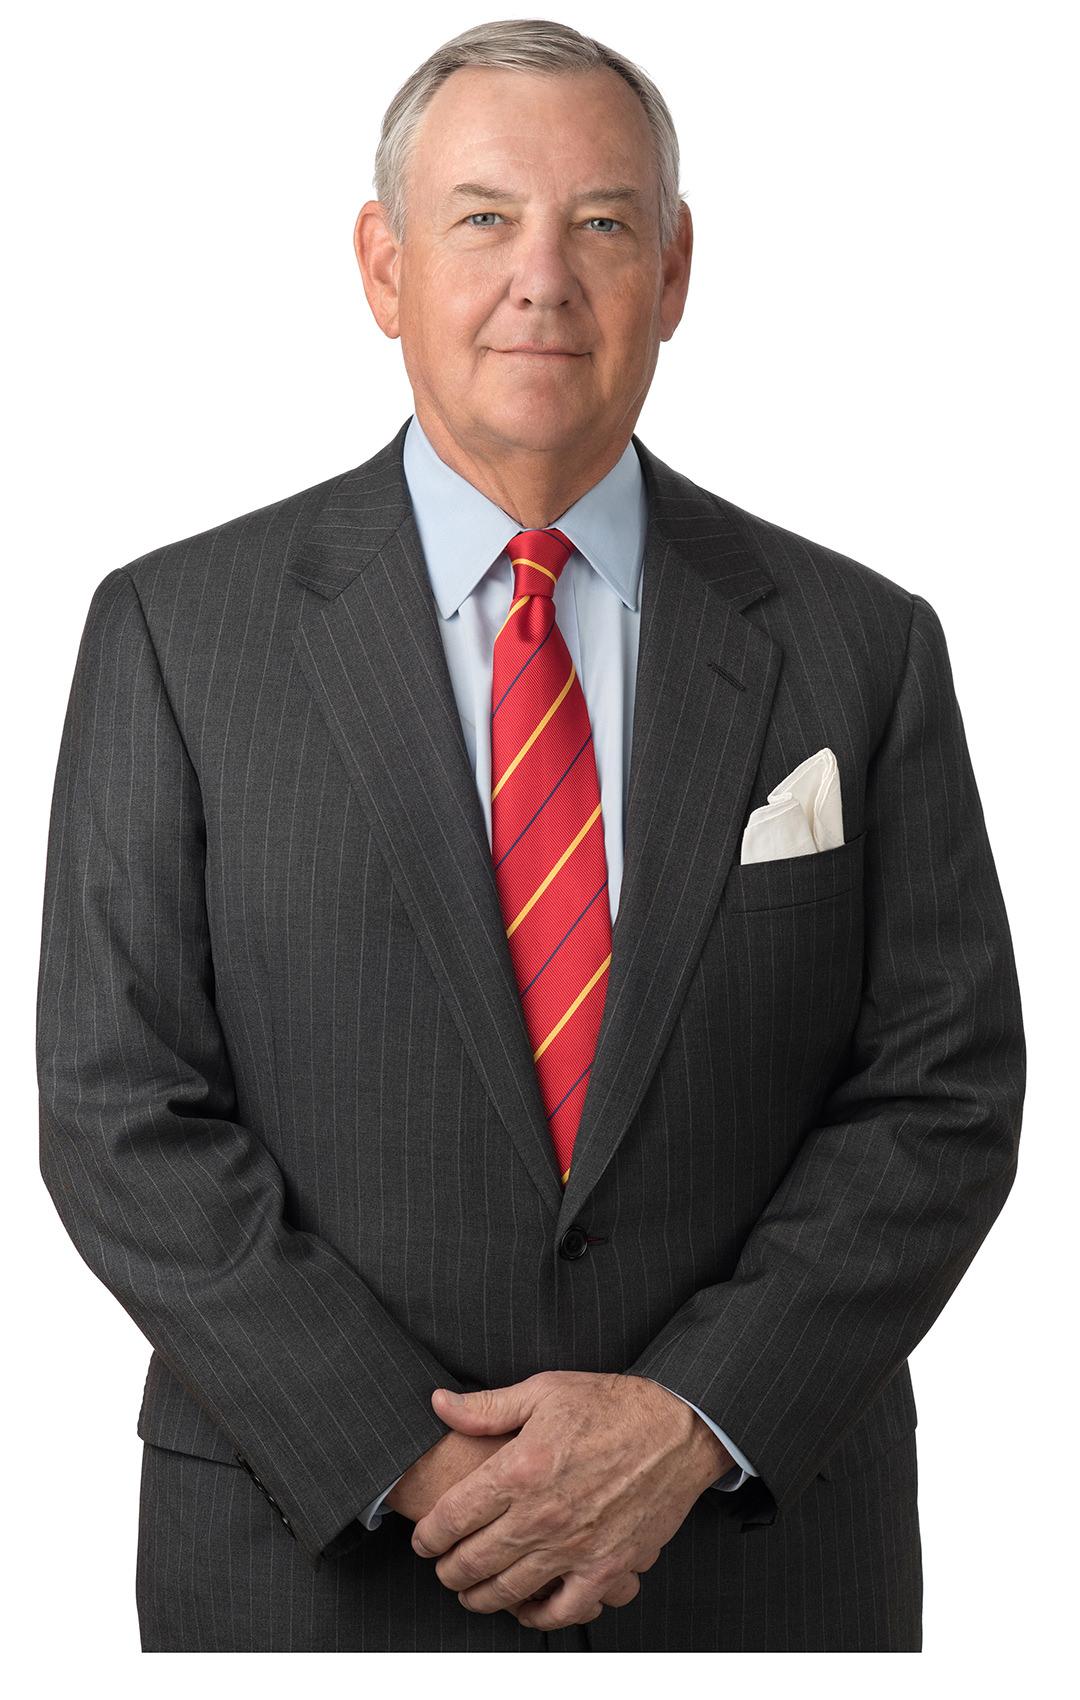 Daniel M. Shea